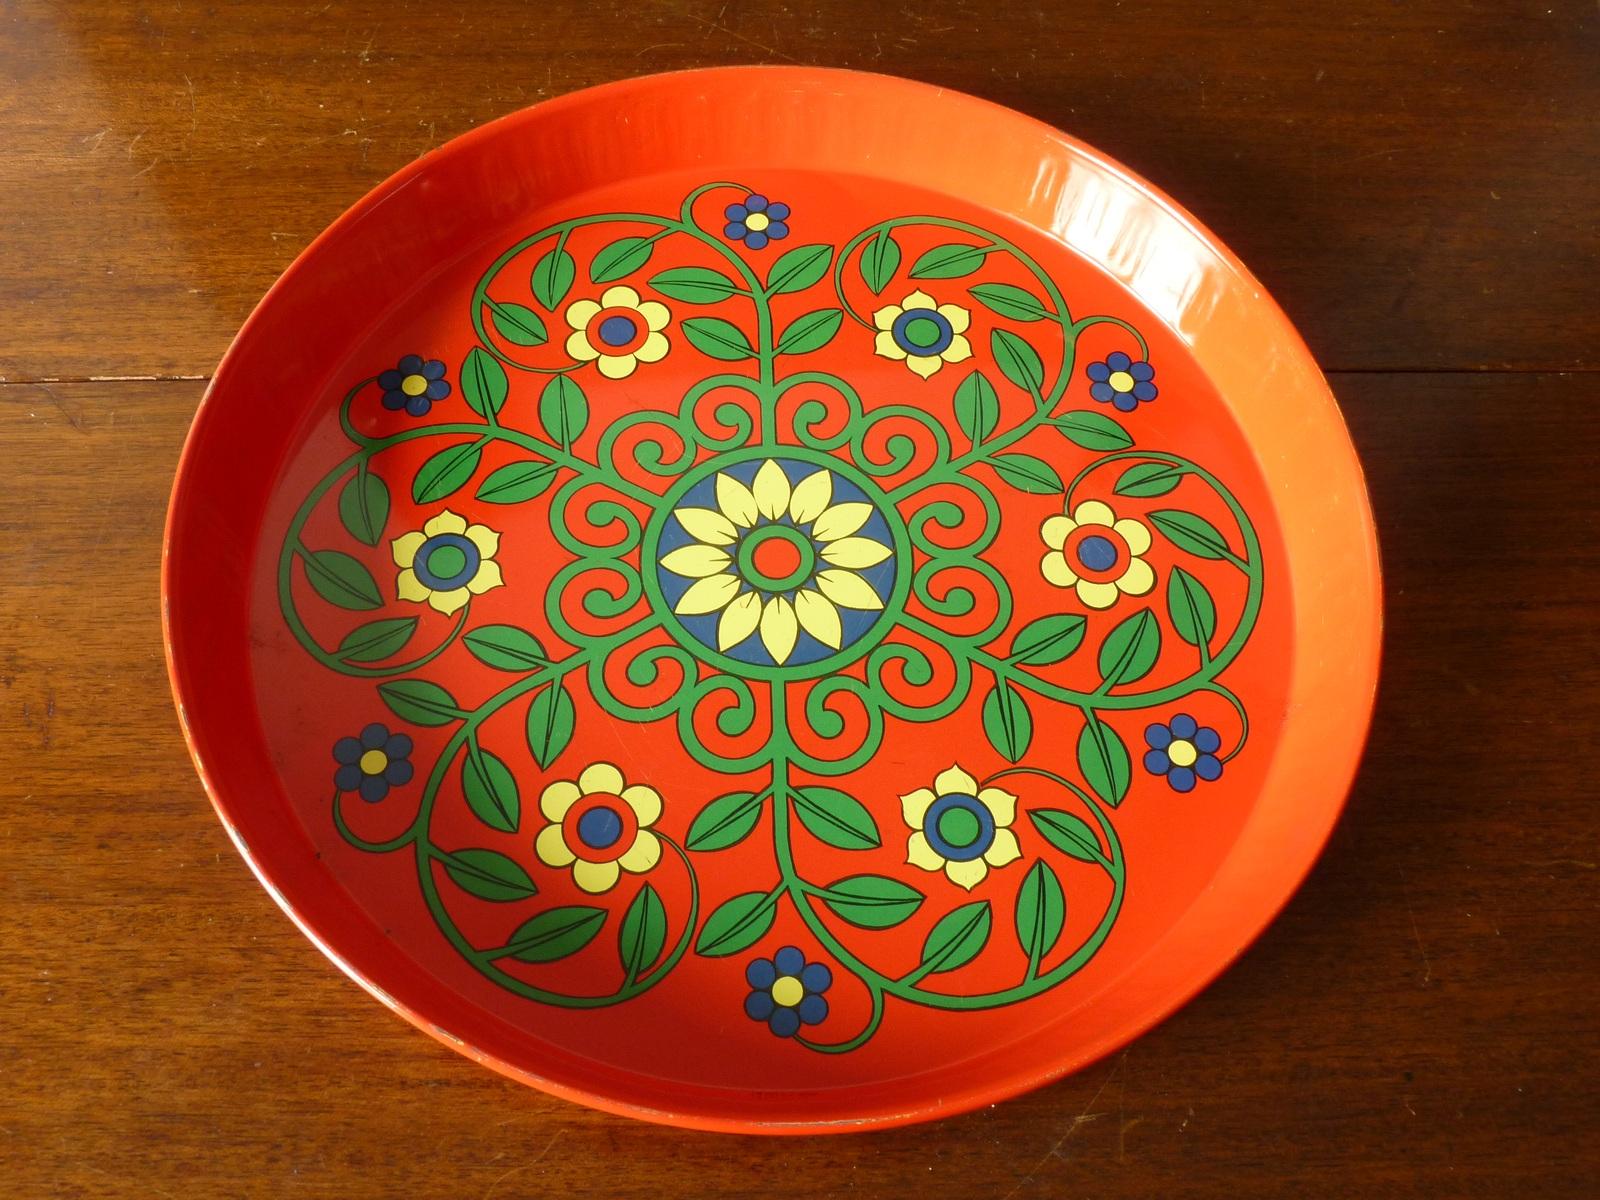 Vintage Floral Metal Drinks Tray (attributed to Pat Albeck)